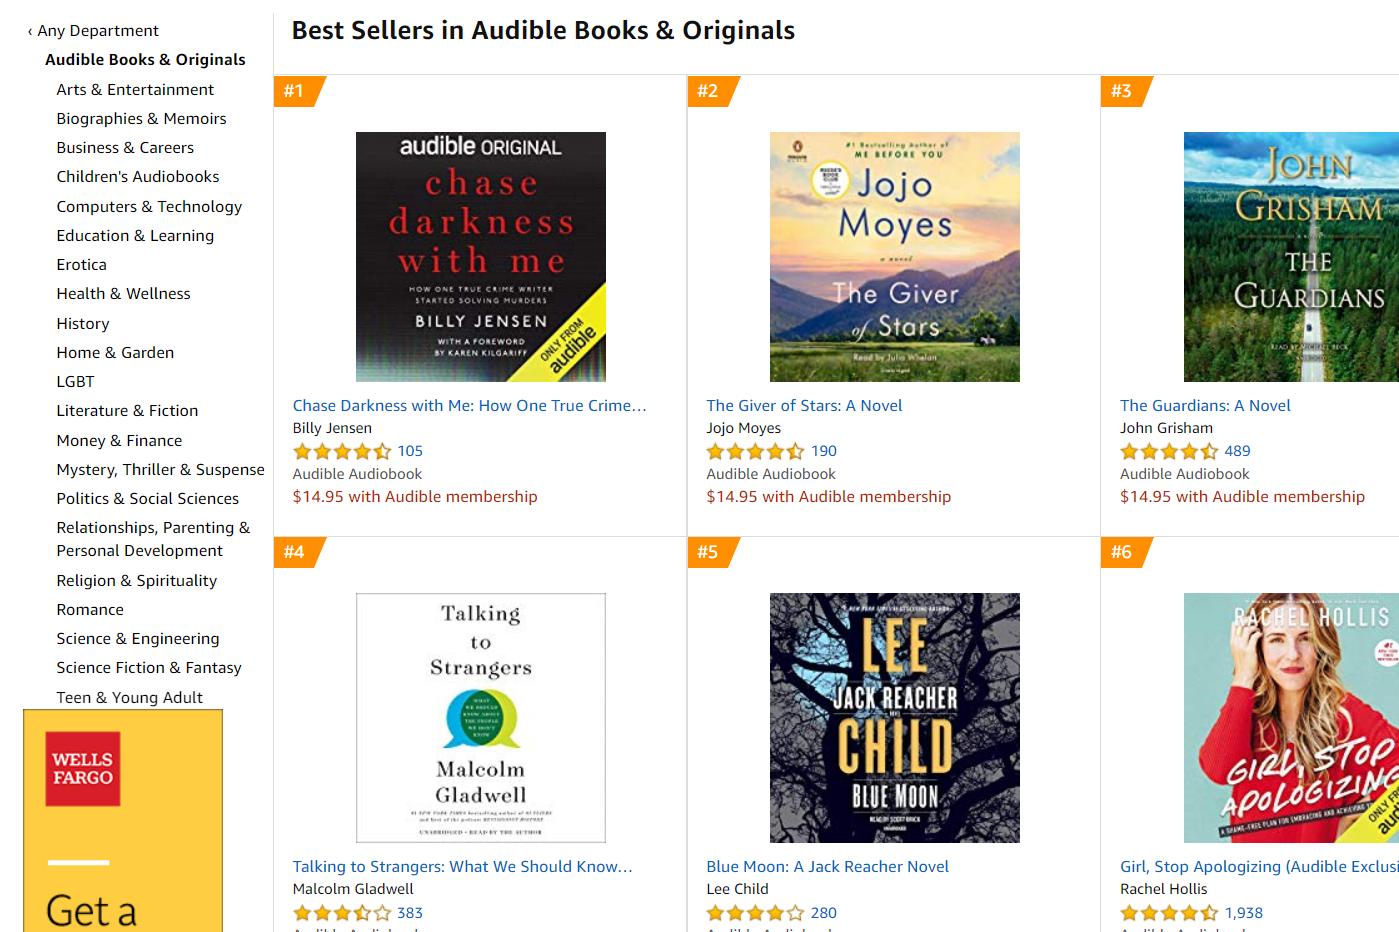 Best selling Audible audiobooks